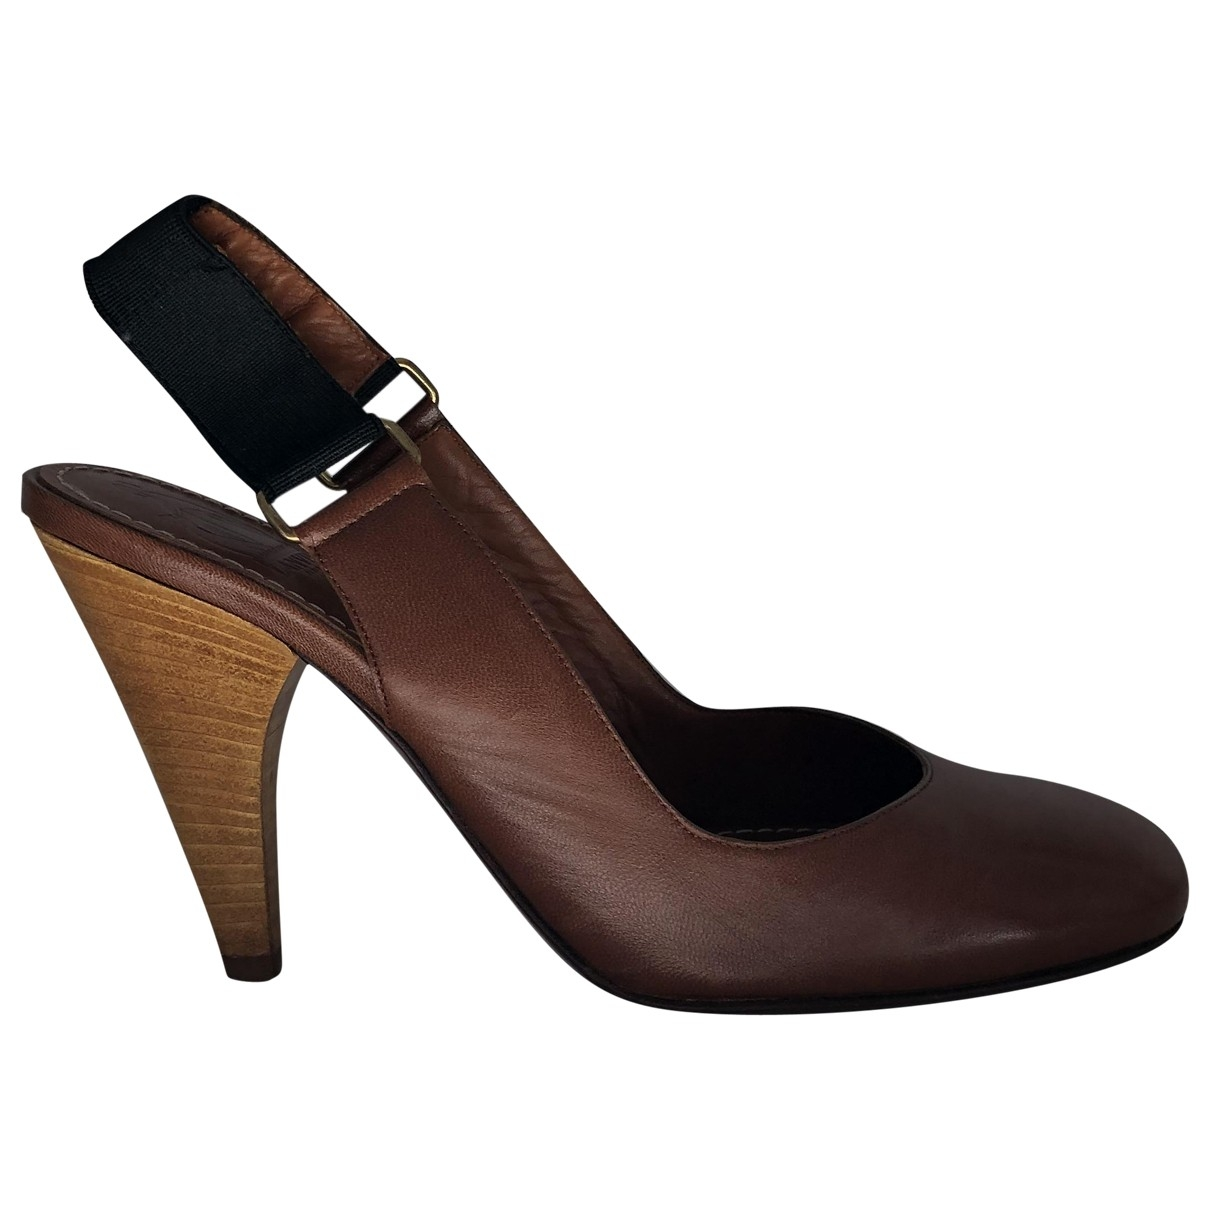 Lanvin \N Brown Leather Heels for Women 37 EU